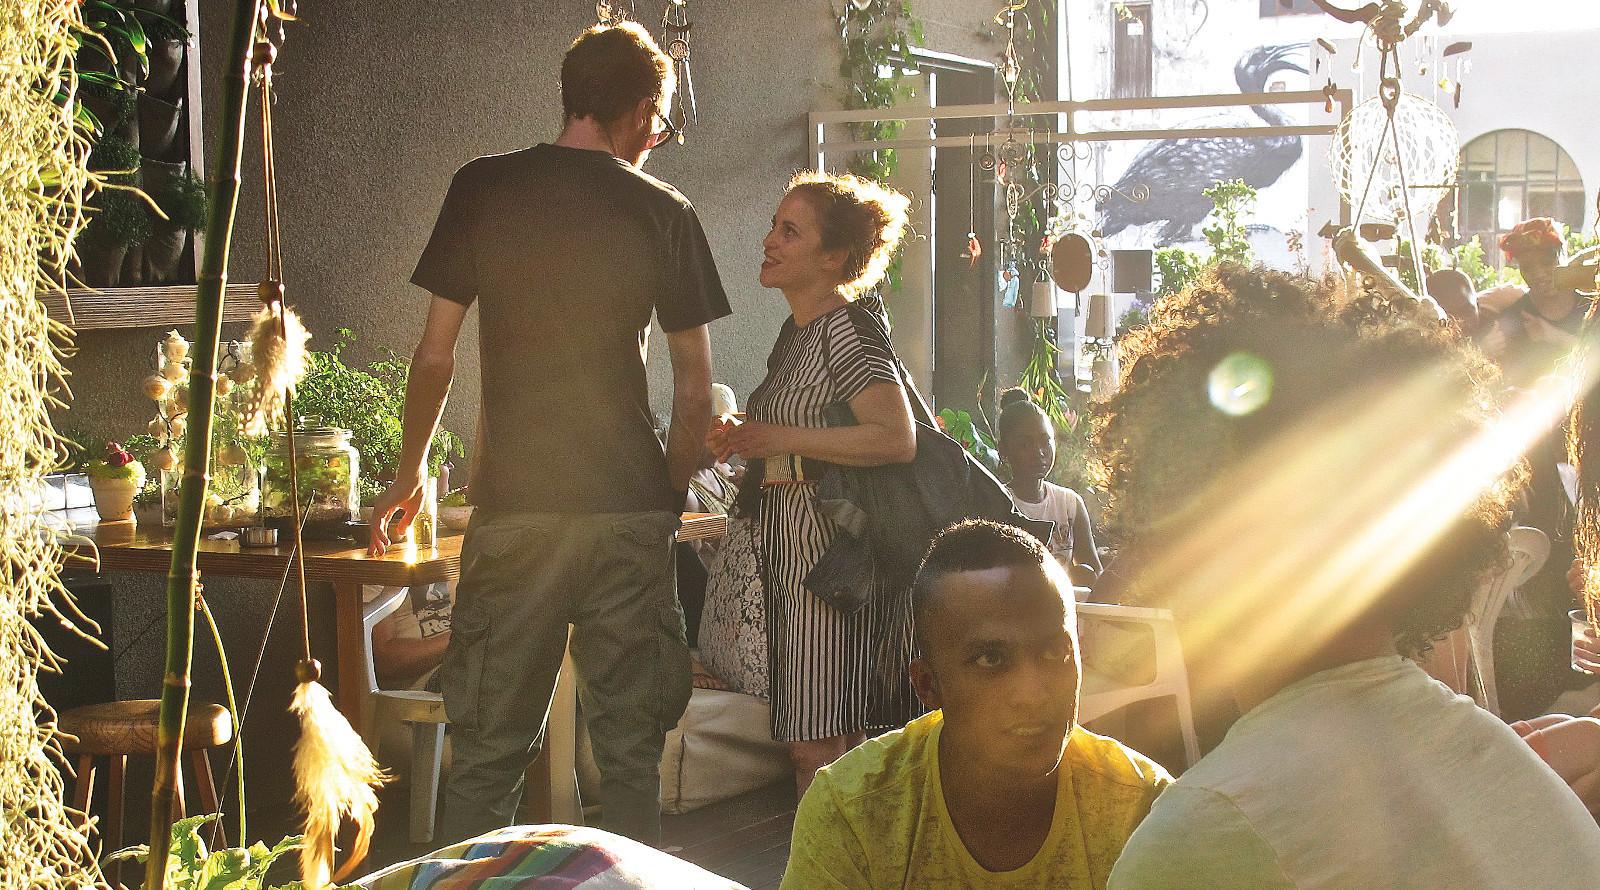 Jozi, an African metropolis